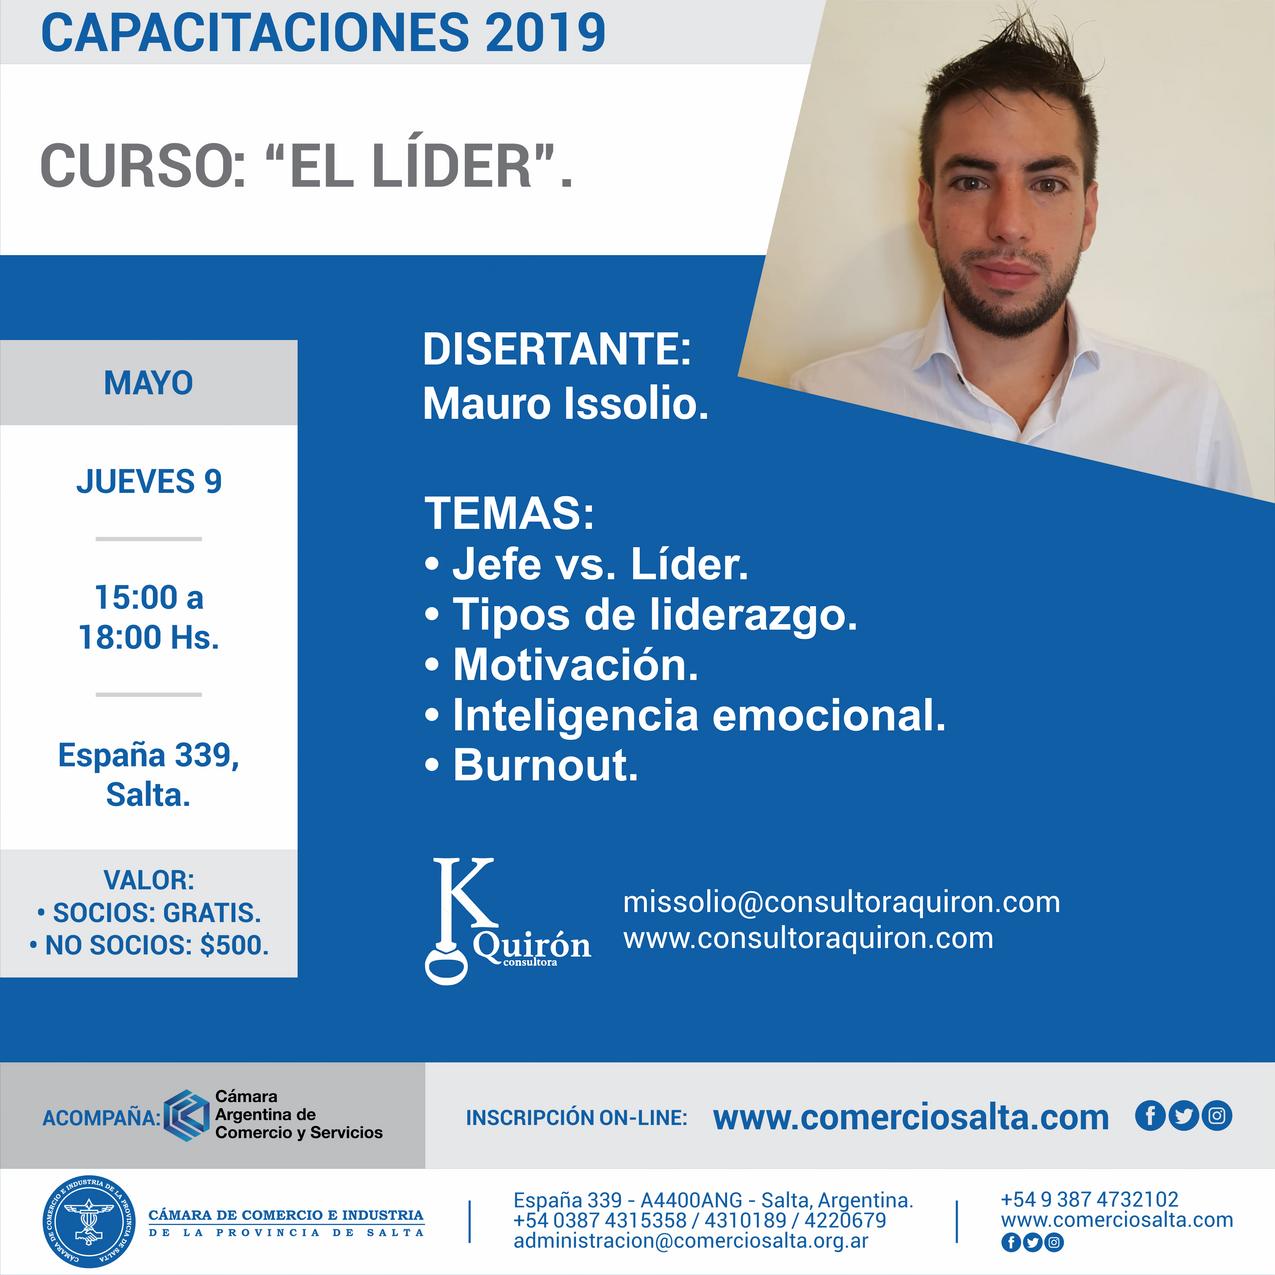 2019.05.09 - El Lider (ISSOLIO) v2